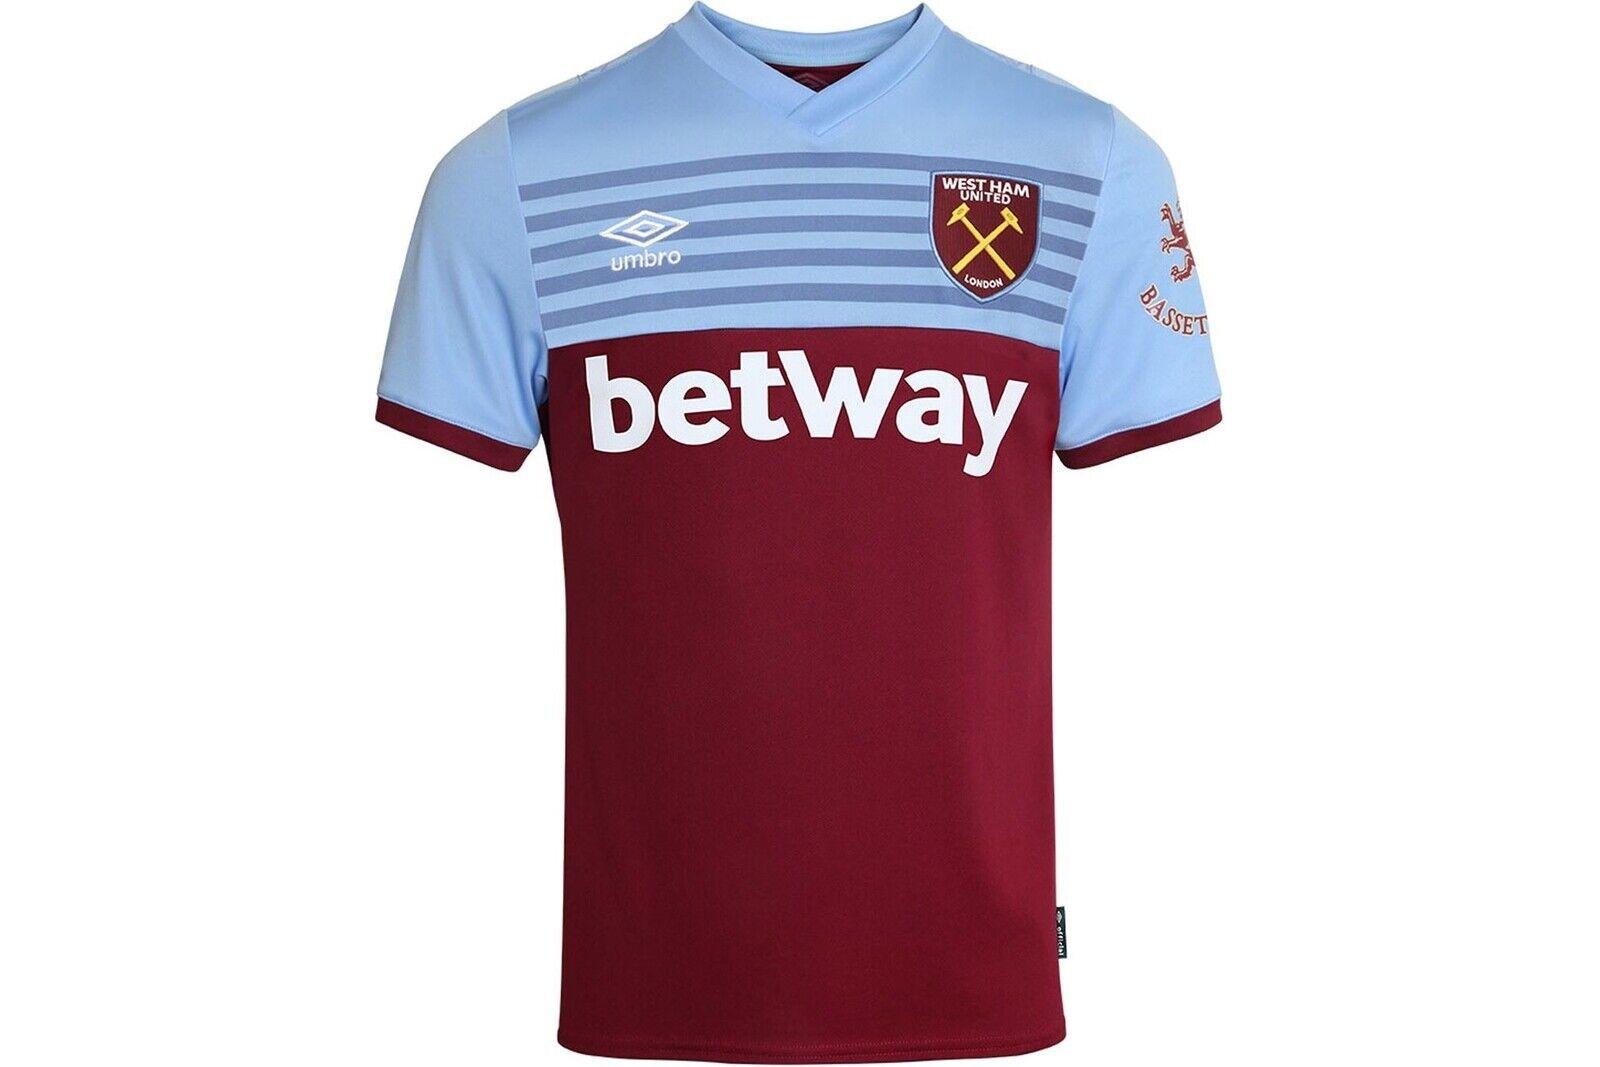 Umbro mannens West Ham United 19 20 Home S S Football Shirt Tshirt Tee Top